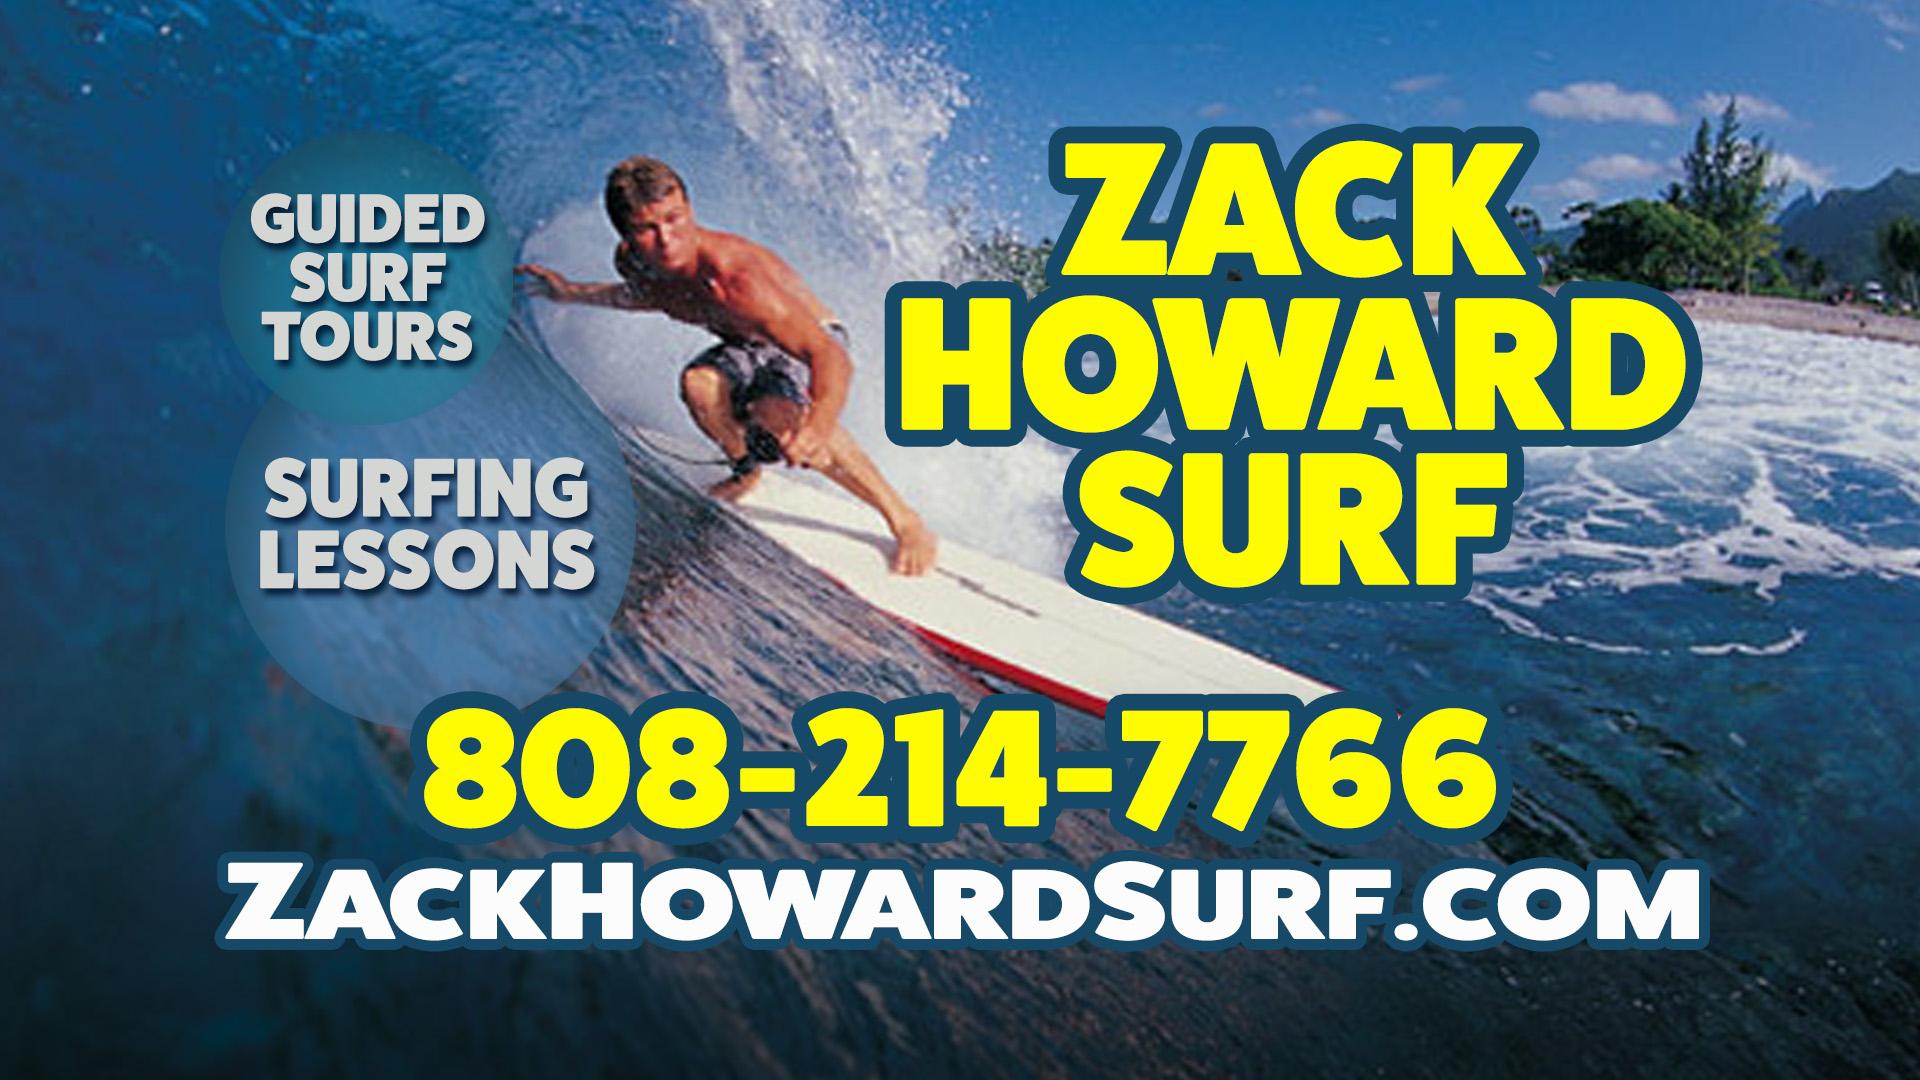 Zack Howard Surf